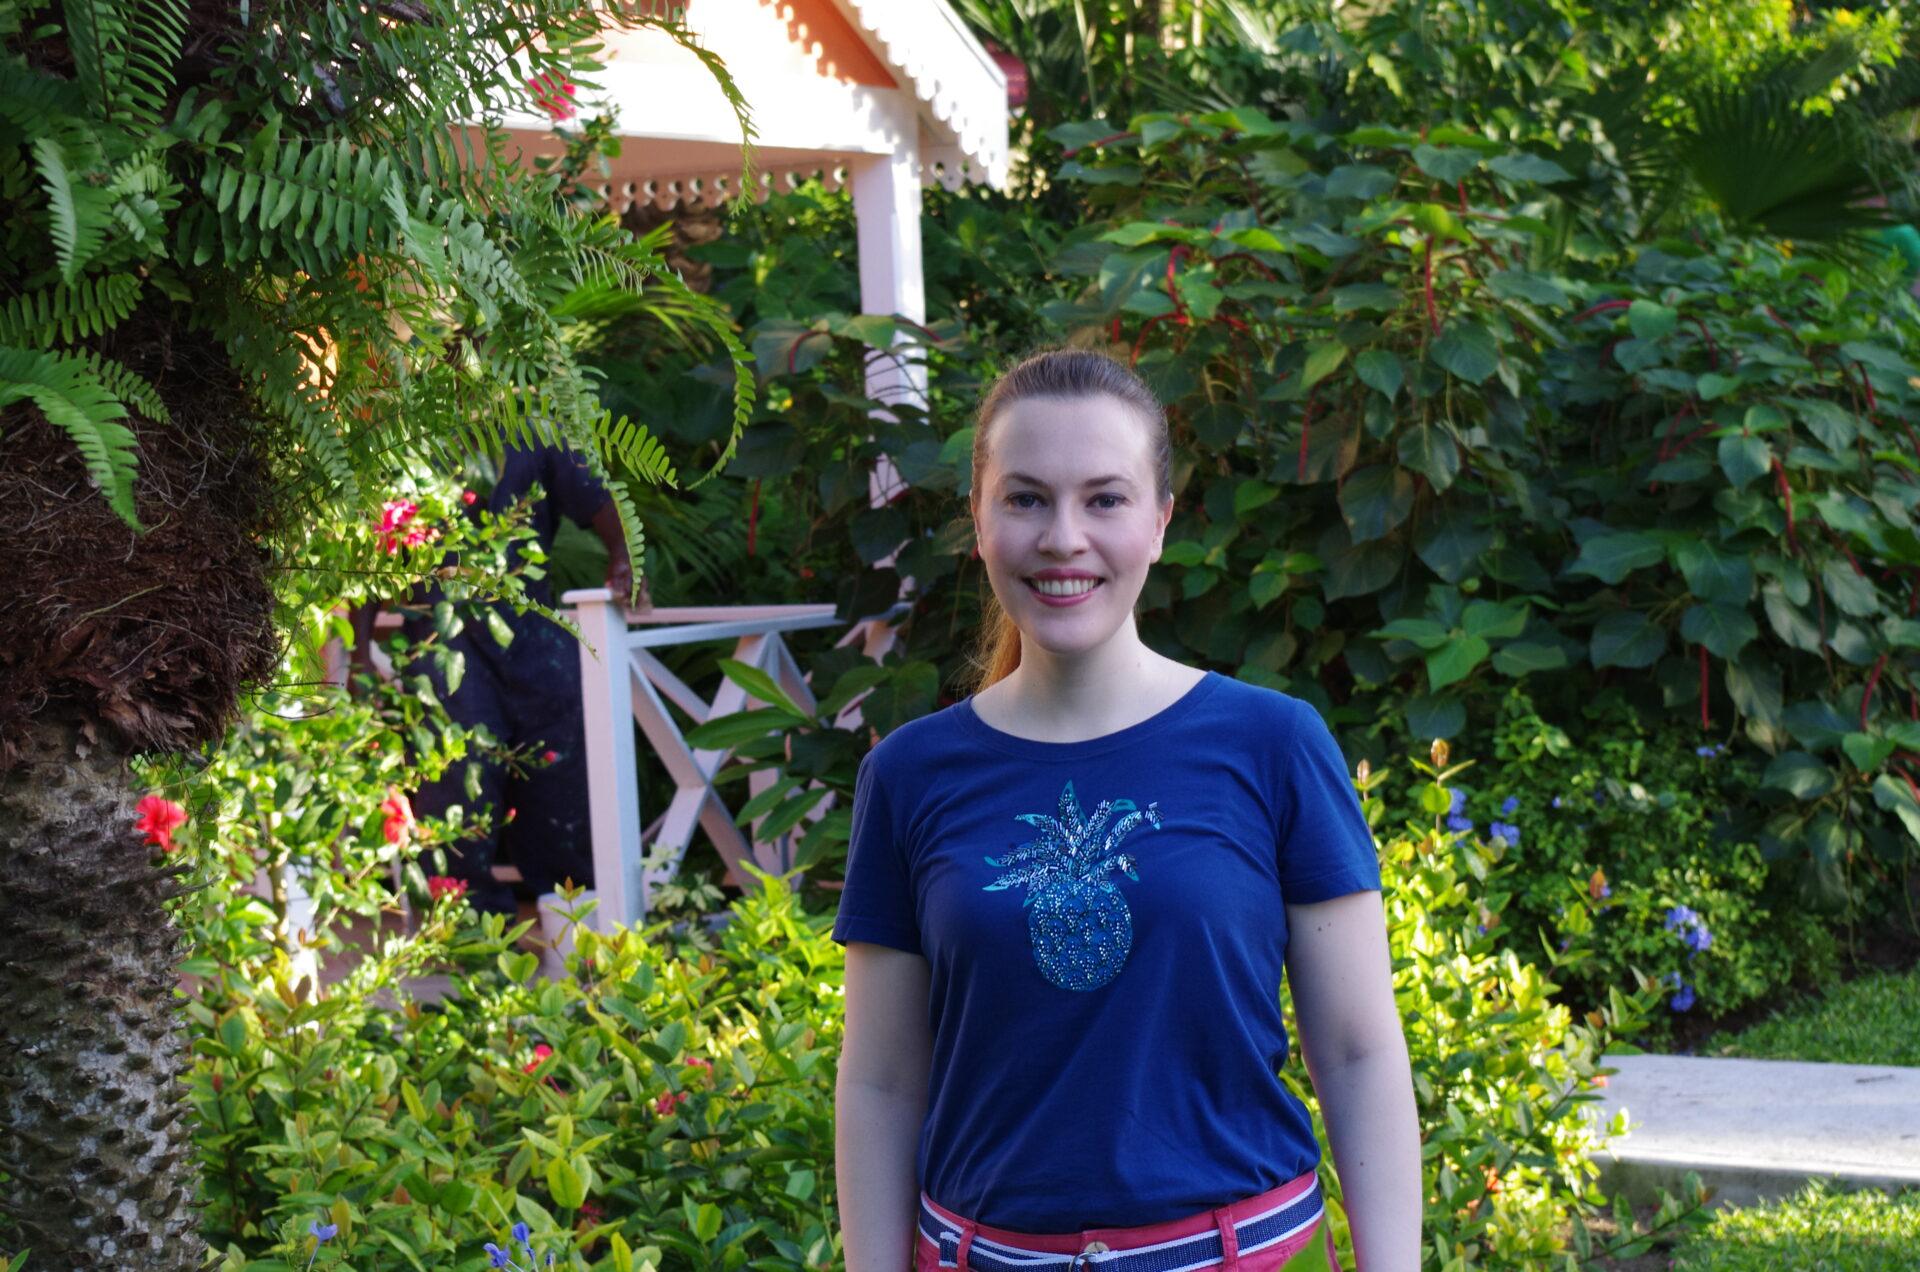 Tommy Bahama Presley Pineapple T-Shirt, Kohls, Dockers